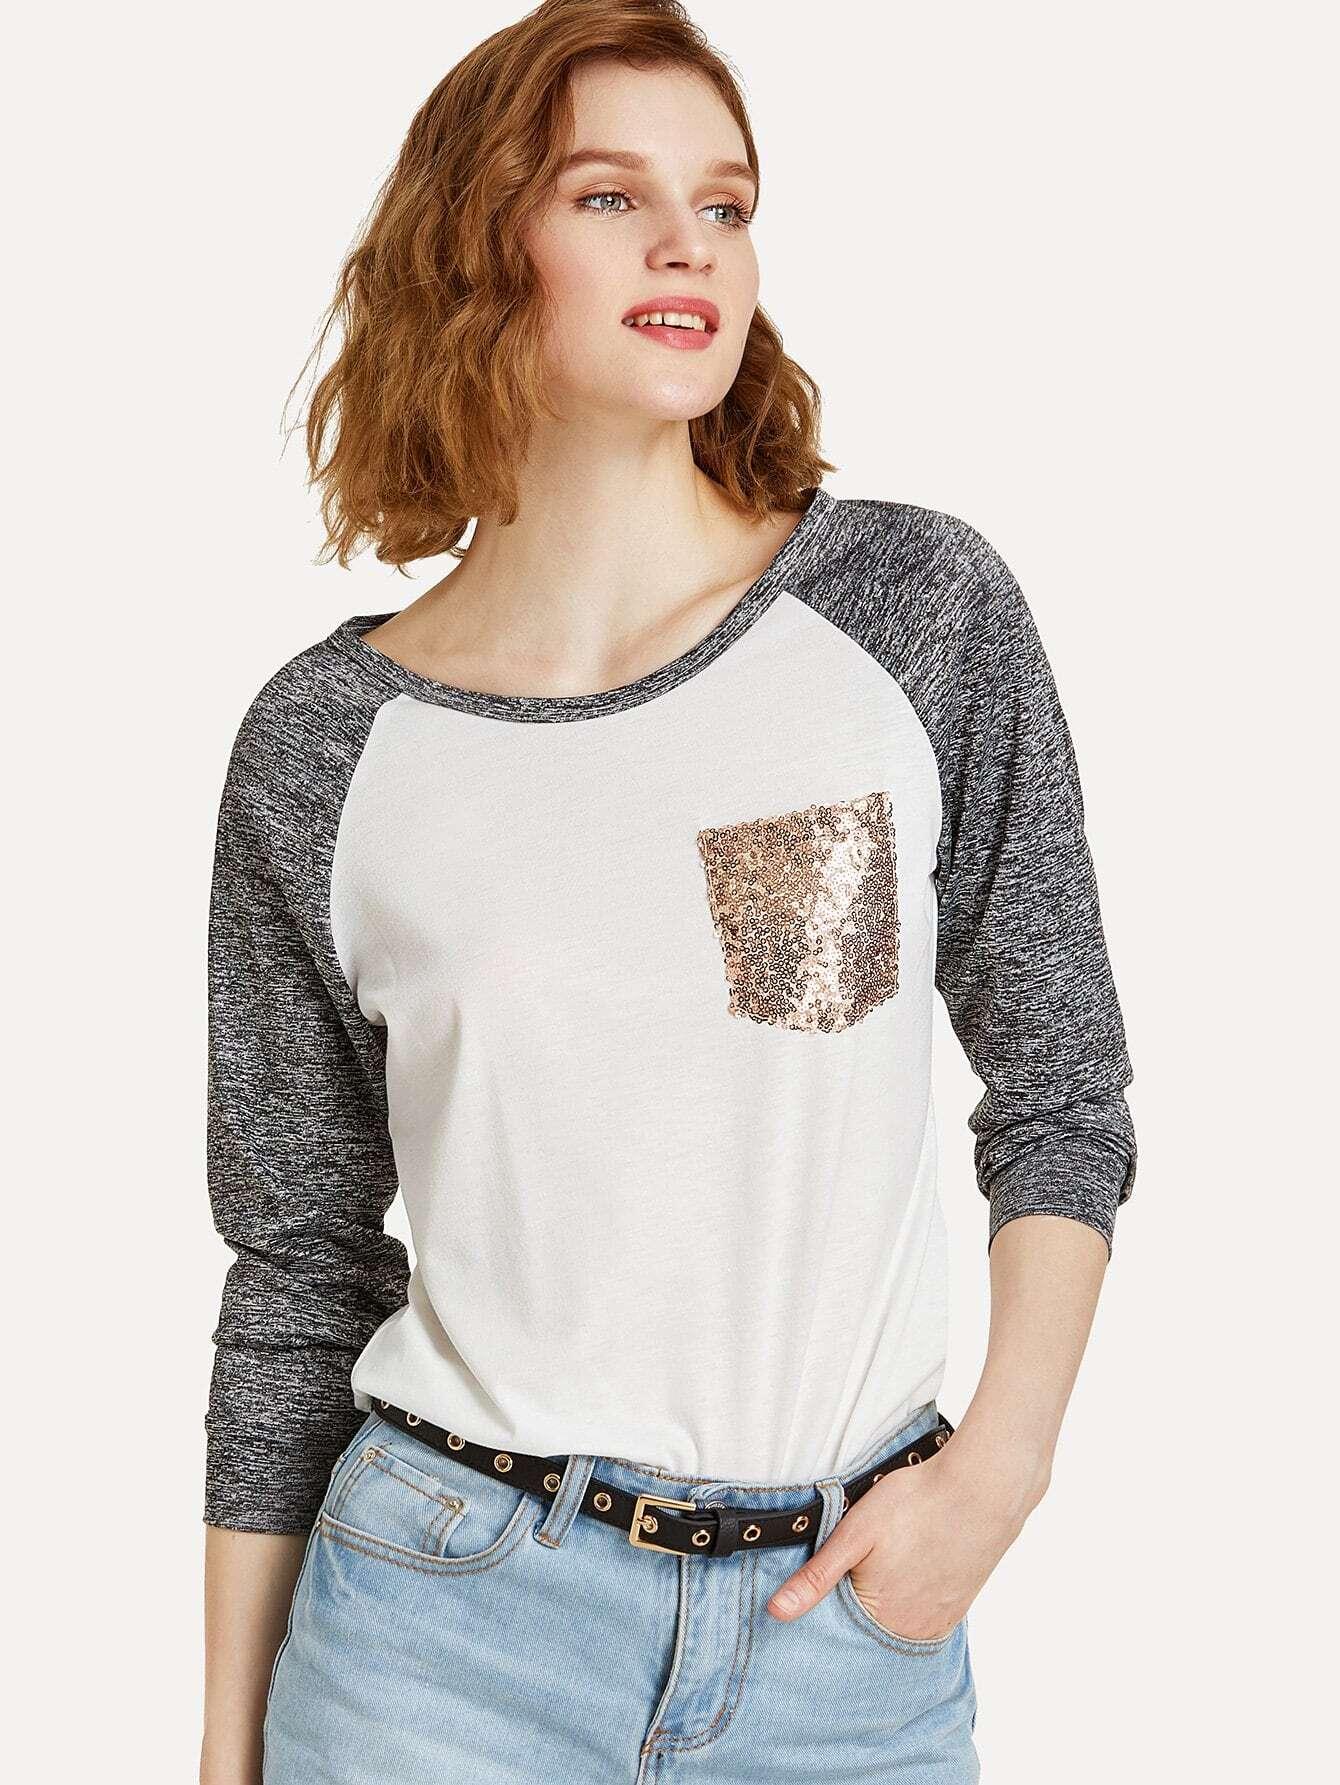 Single Pocket Space Dye Raglan Sleeve T-shirt dip dye button down short sleeve shirt